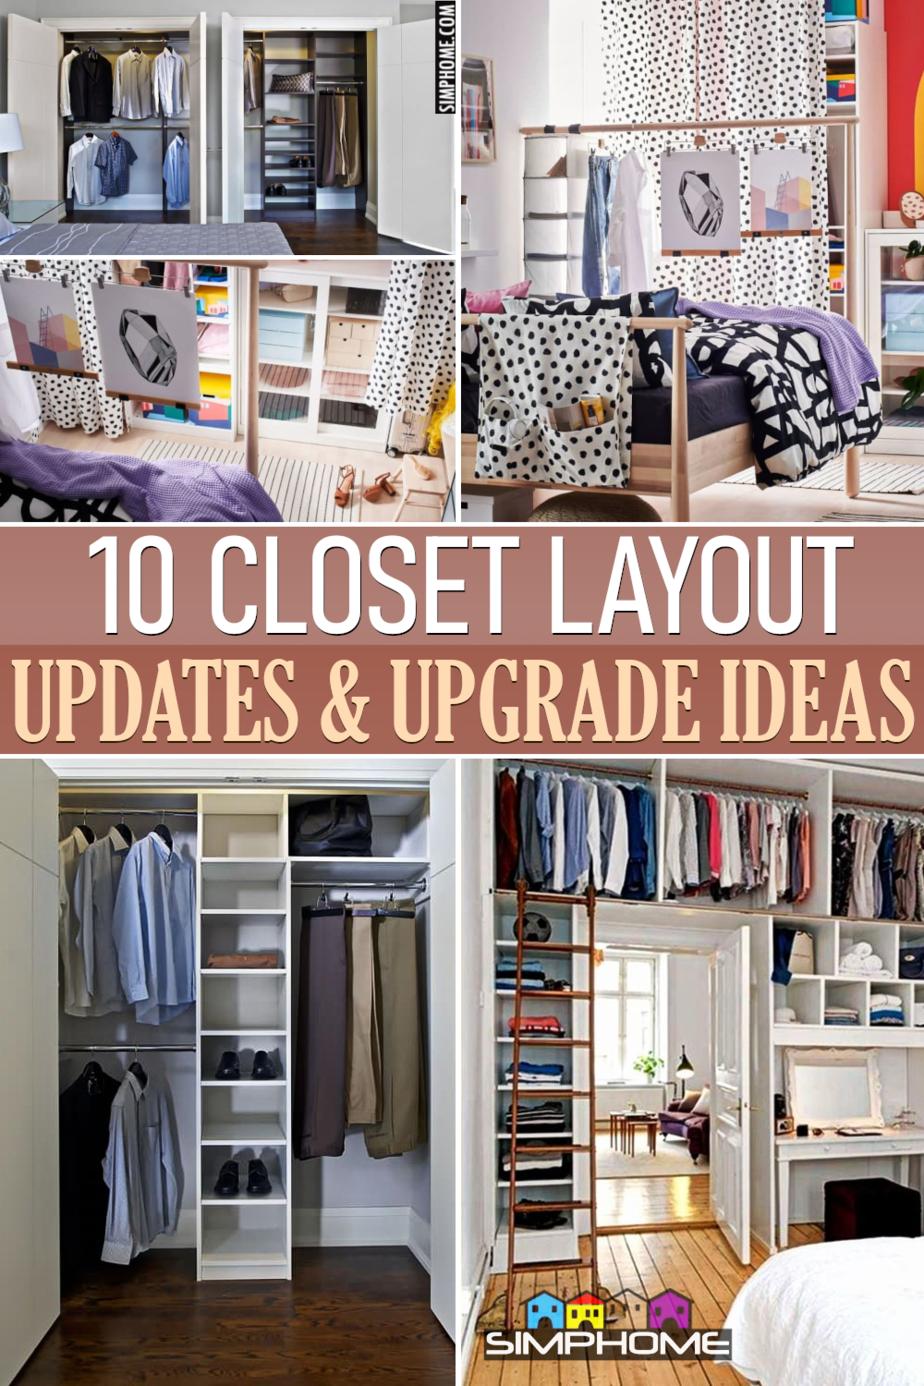 10 Closet Layout Ideas via Simphome.comFeatured